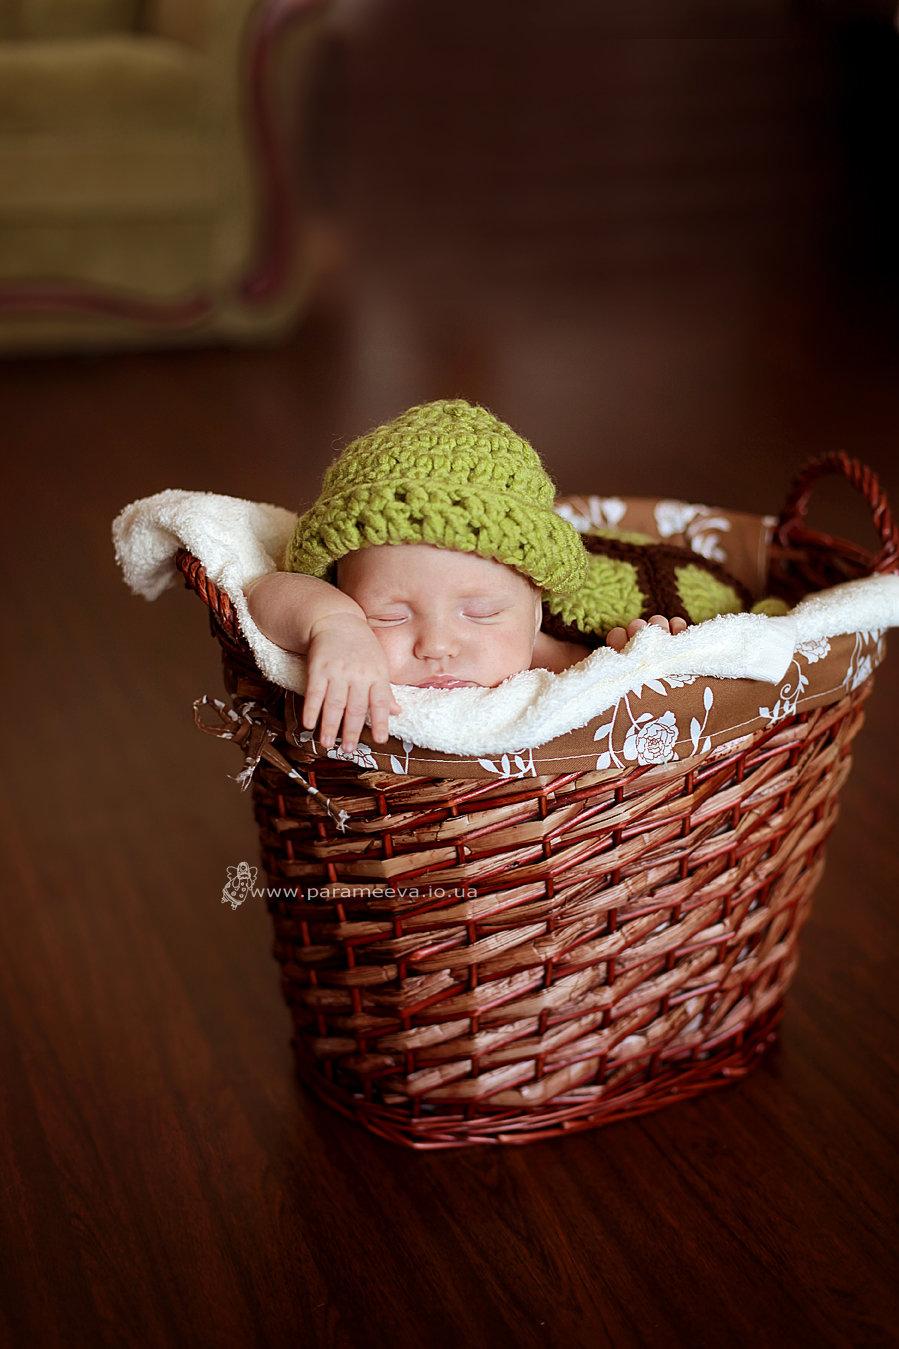 Ребенка в корзине фото